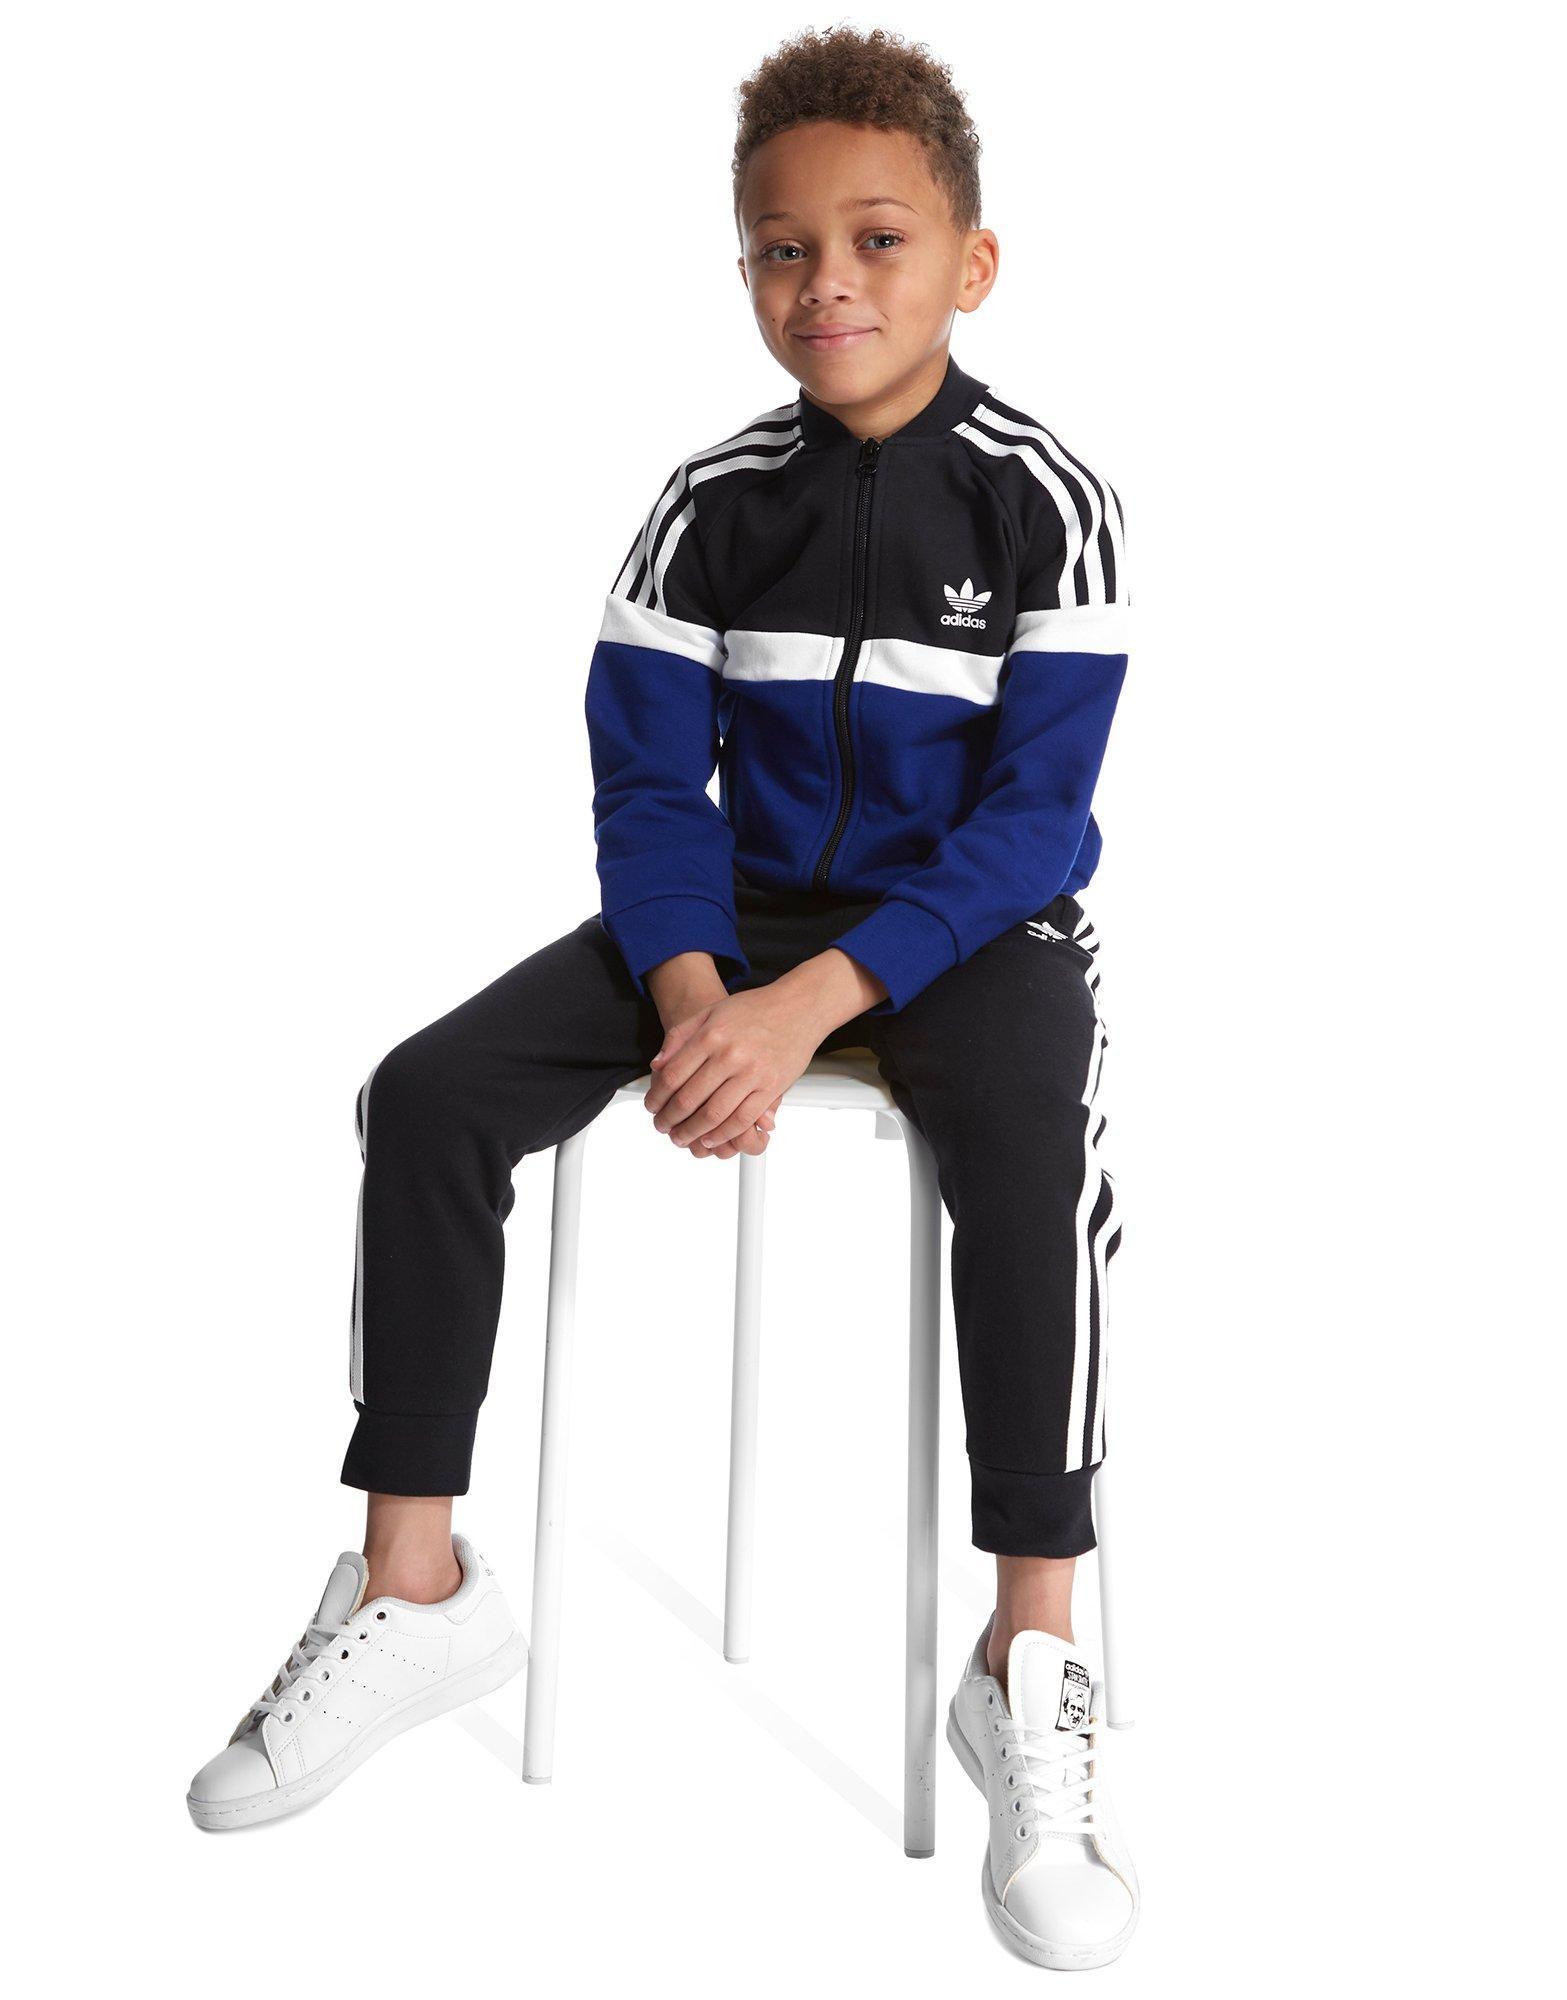 Lyst - adidas Originals Itasca Fleece Superstar Suit Children in ... c2556c0bcf